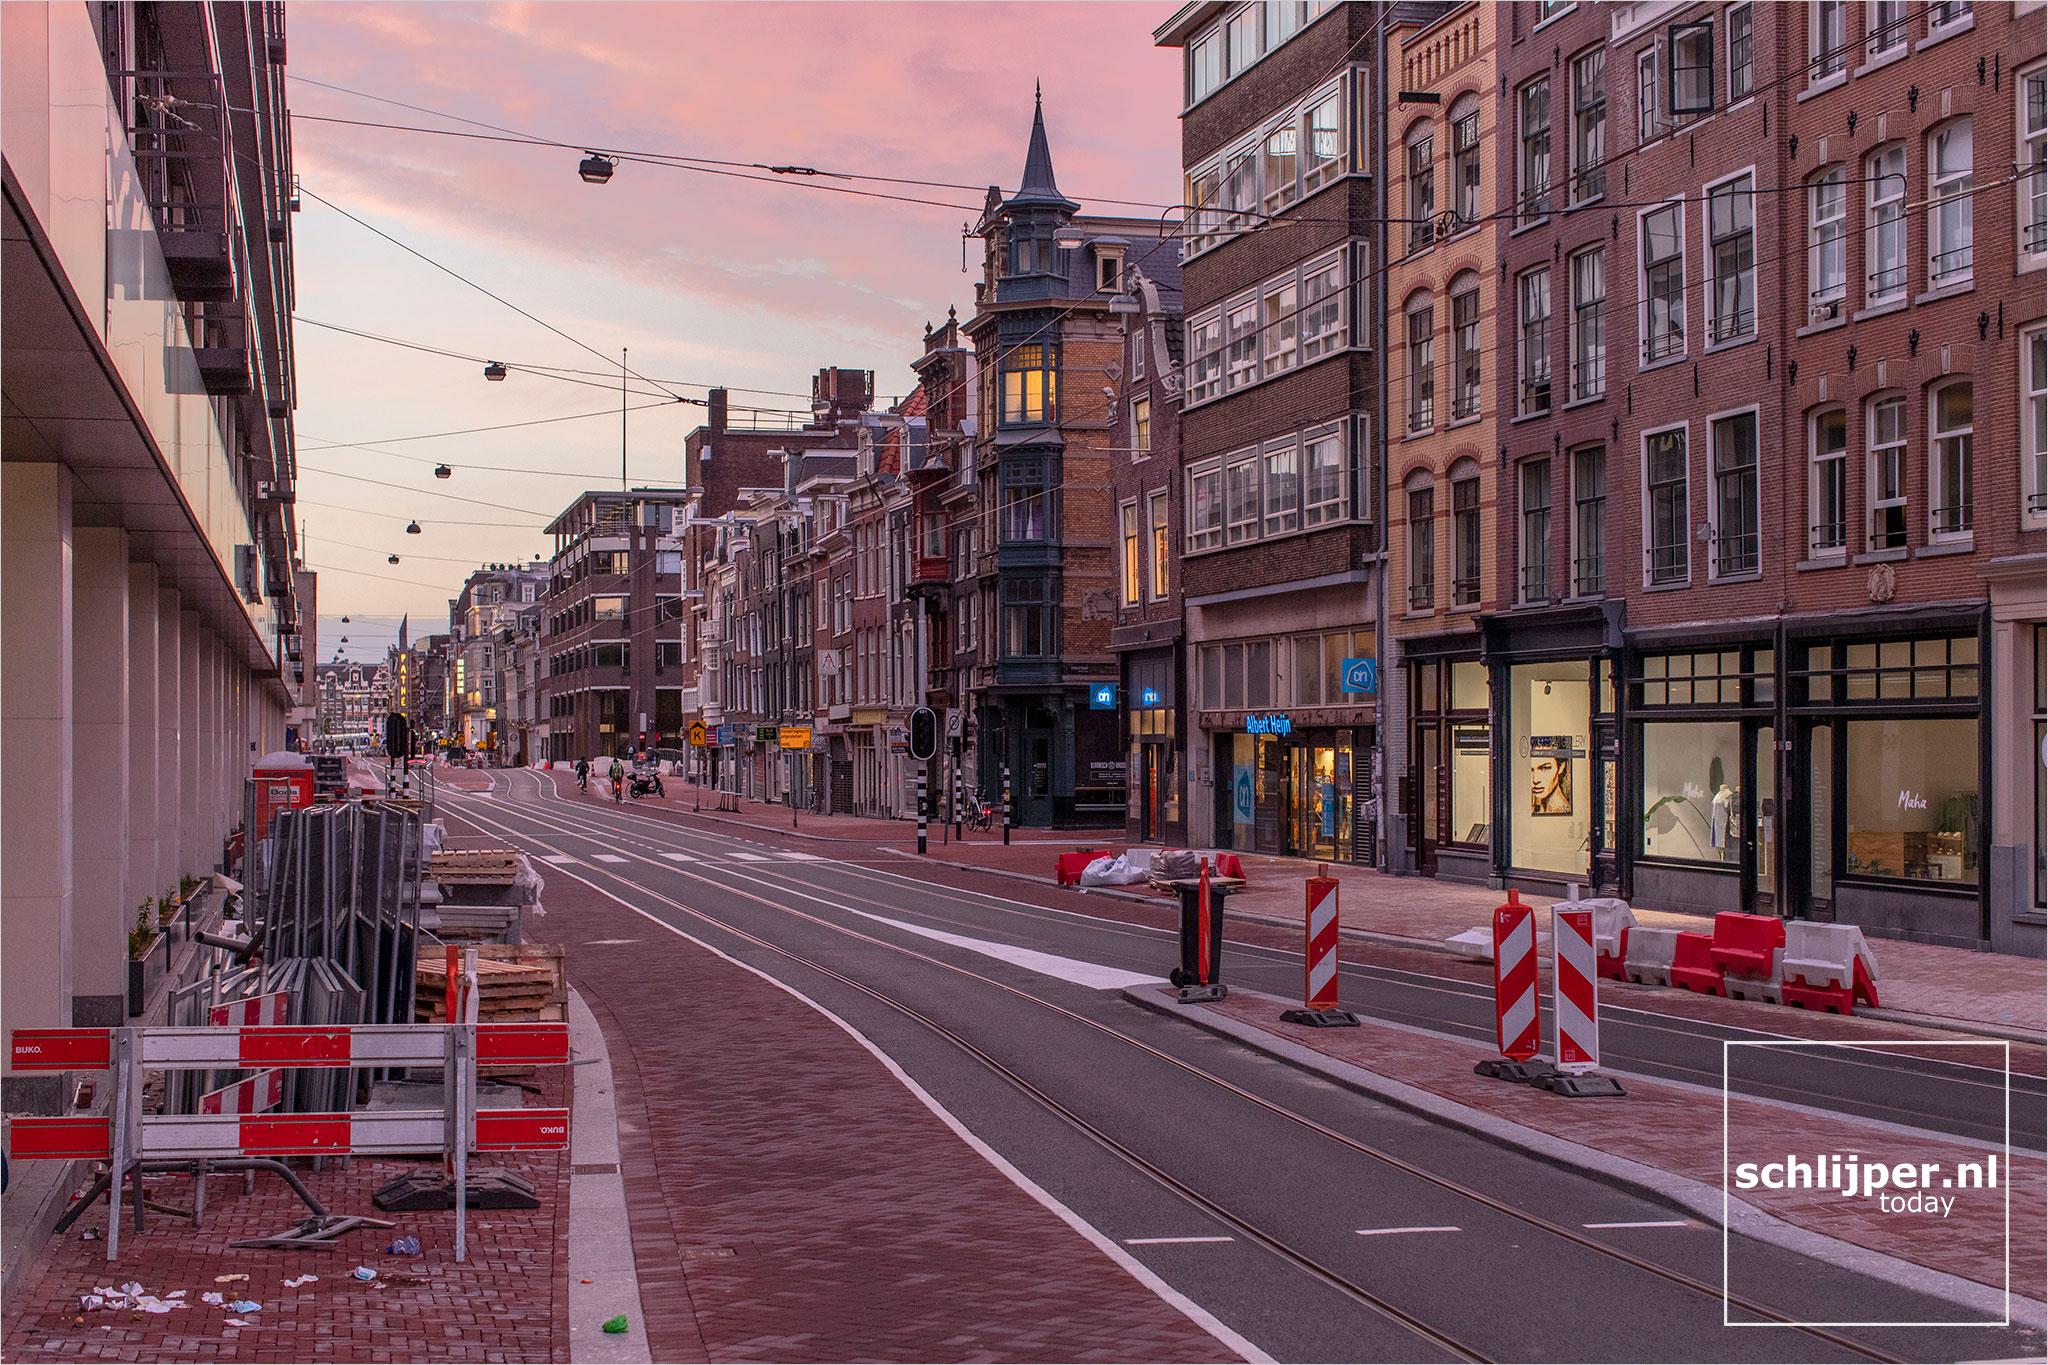 The Netherlands, Amsterdam, 22 juni 2021